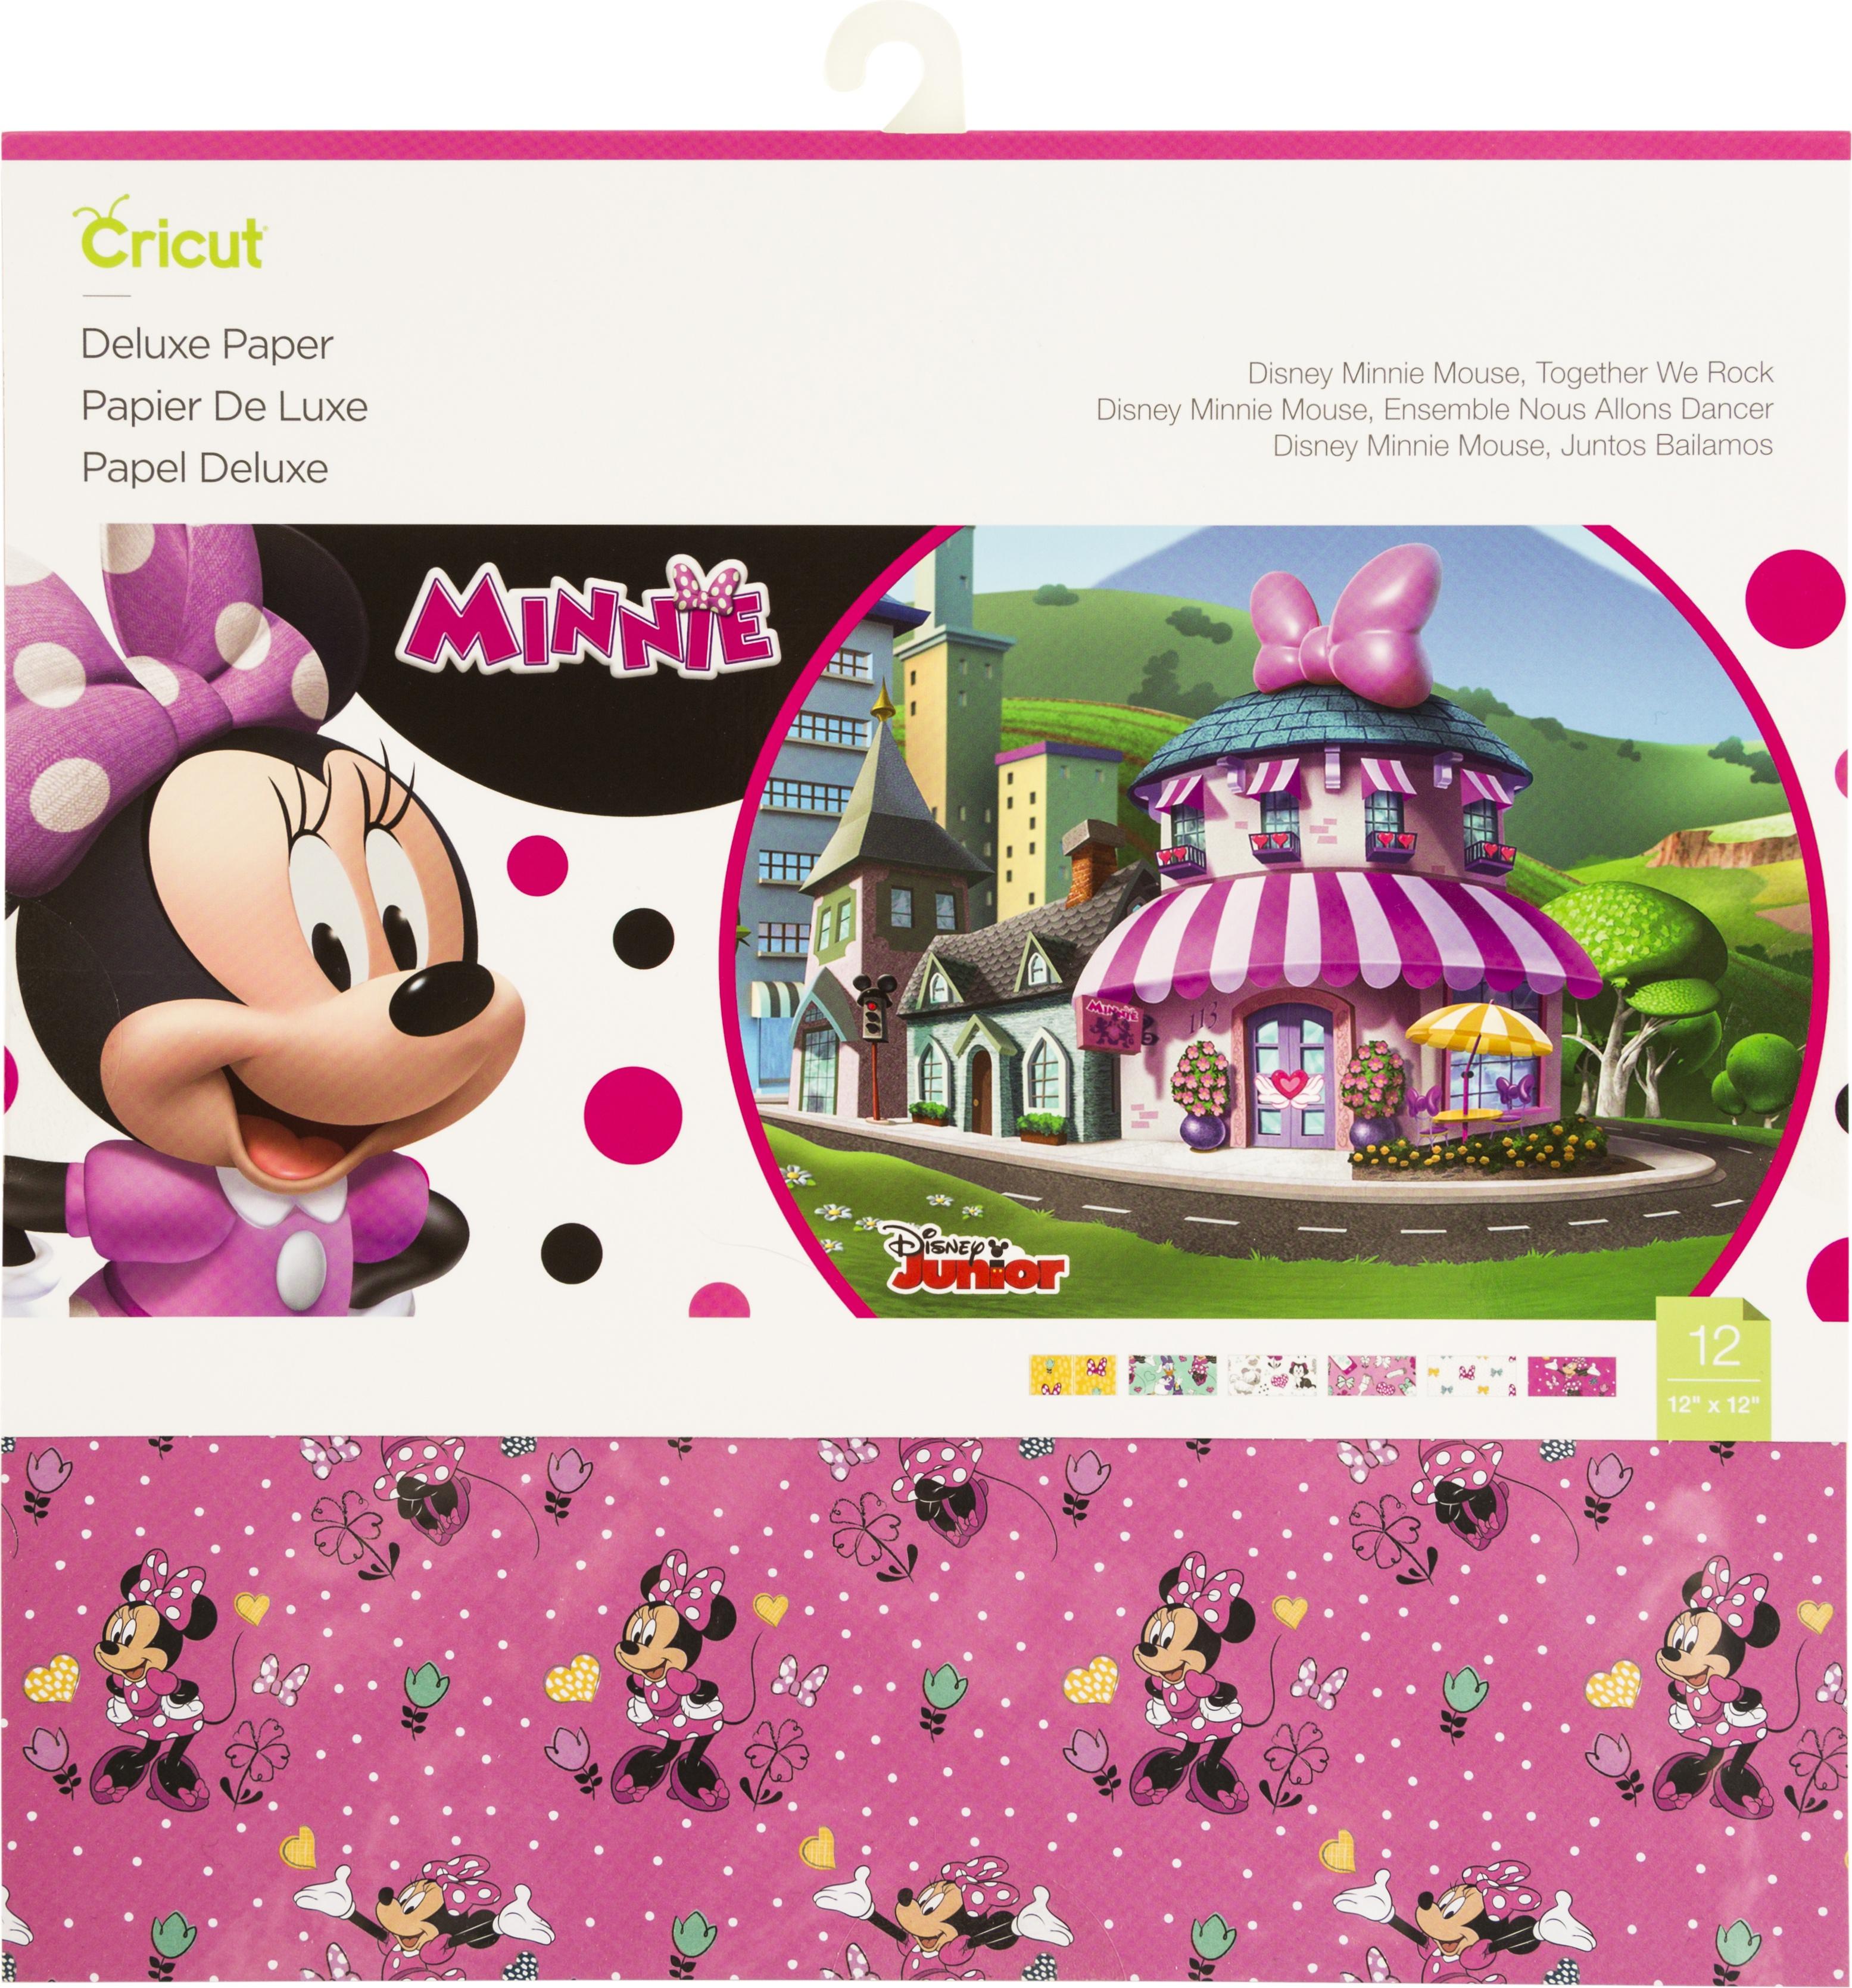 Cricut 12X12 Deluxe Paper 12/Pkg-Disney Minnie Mouse, Together We Rock